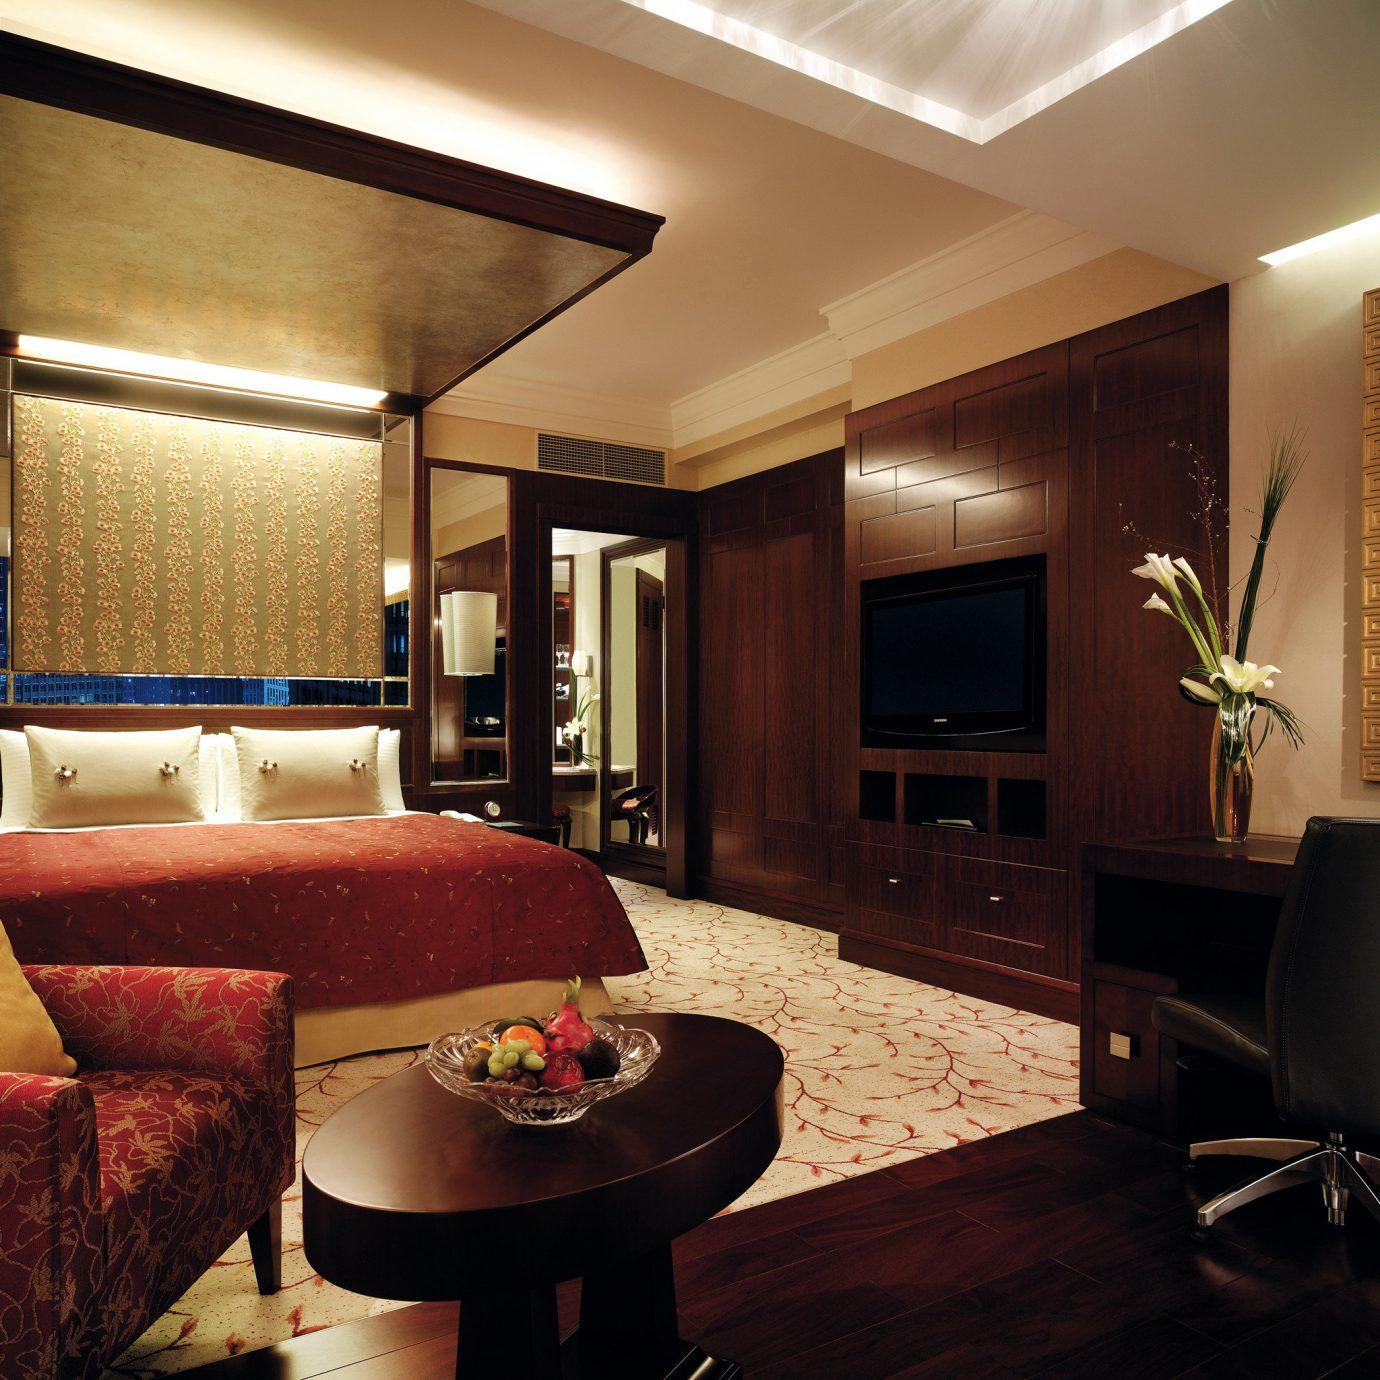 Bedroom Elegant Hip Luxury Suite sofa property living room home condominium recreation room Lobby